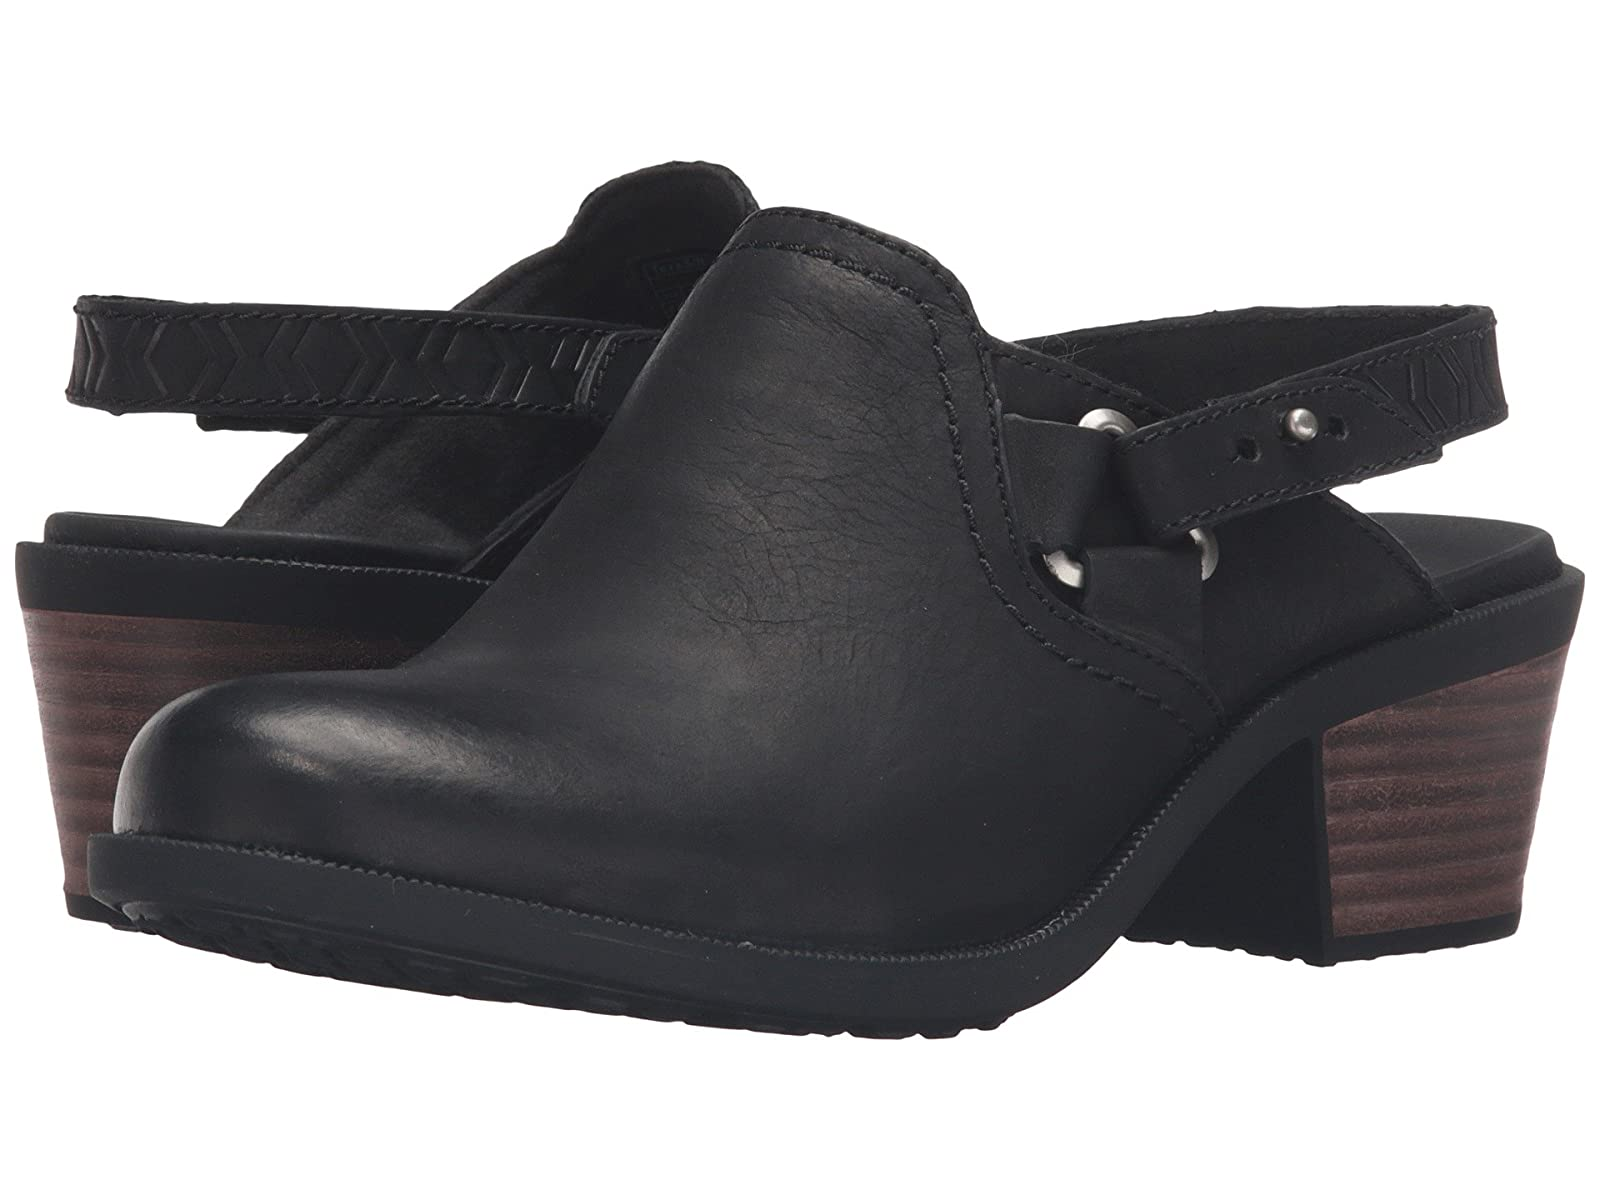 Teva Foxy Clog LeatherCheap and distinctive eye-catching shoes